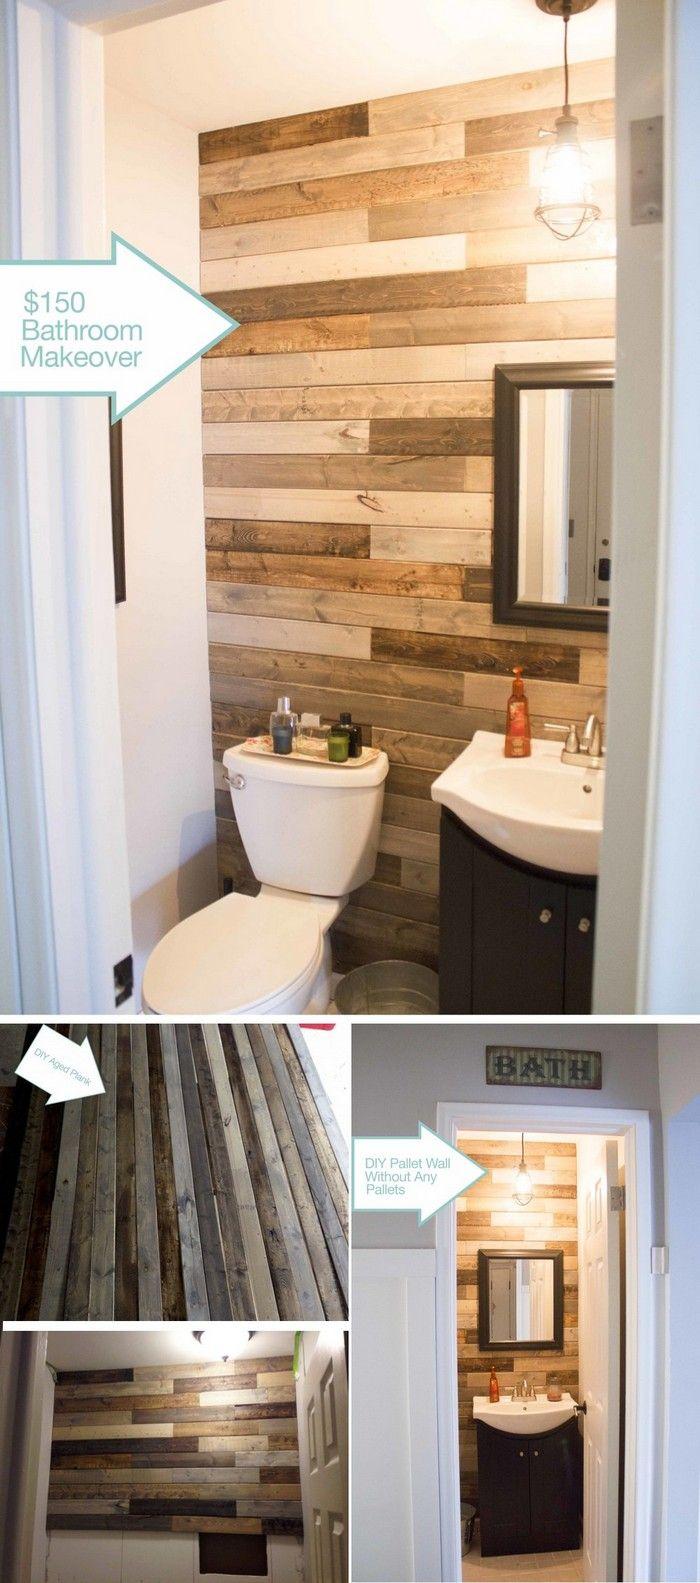 Panel Bathroom Accent Wall Accent Walls Barn Wood Bathroom Bathroom Accent Wall Wood Wall Bathroom